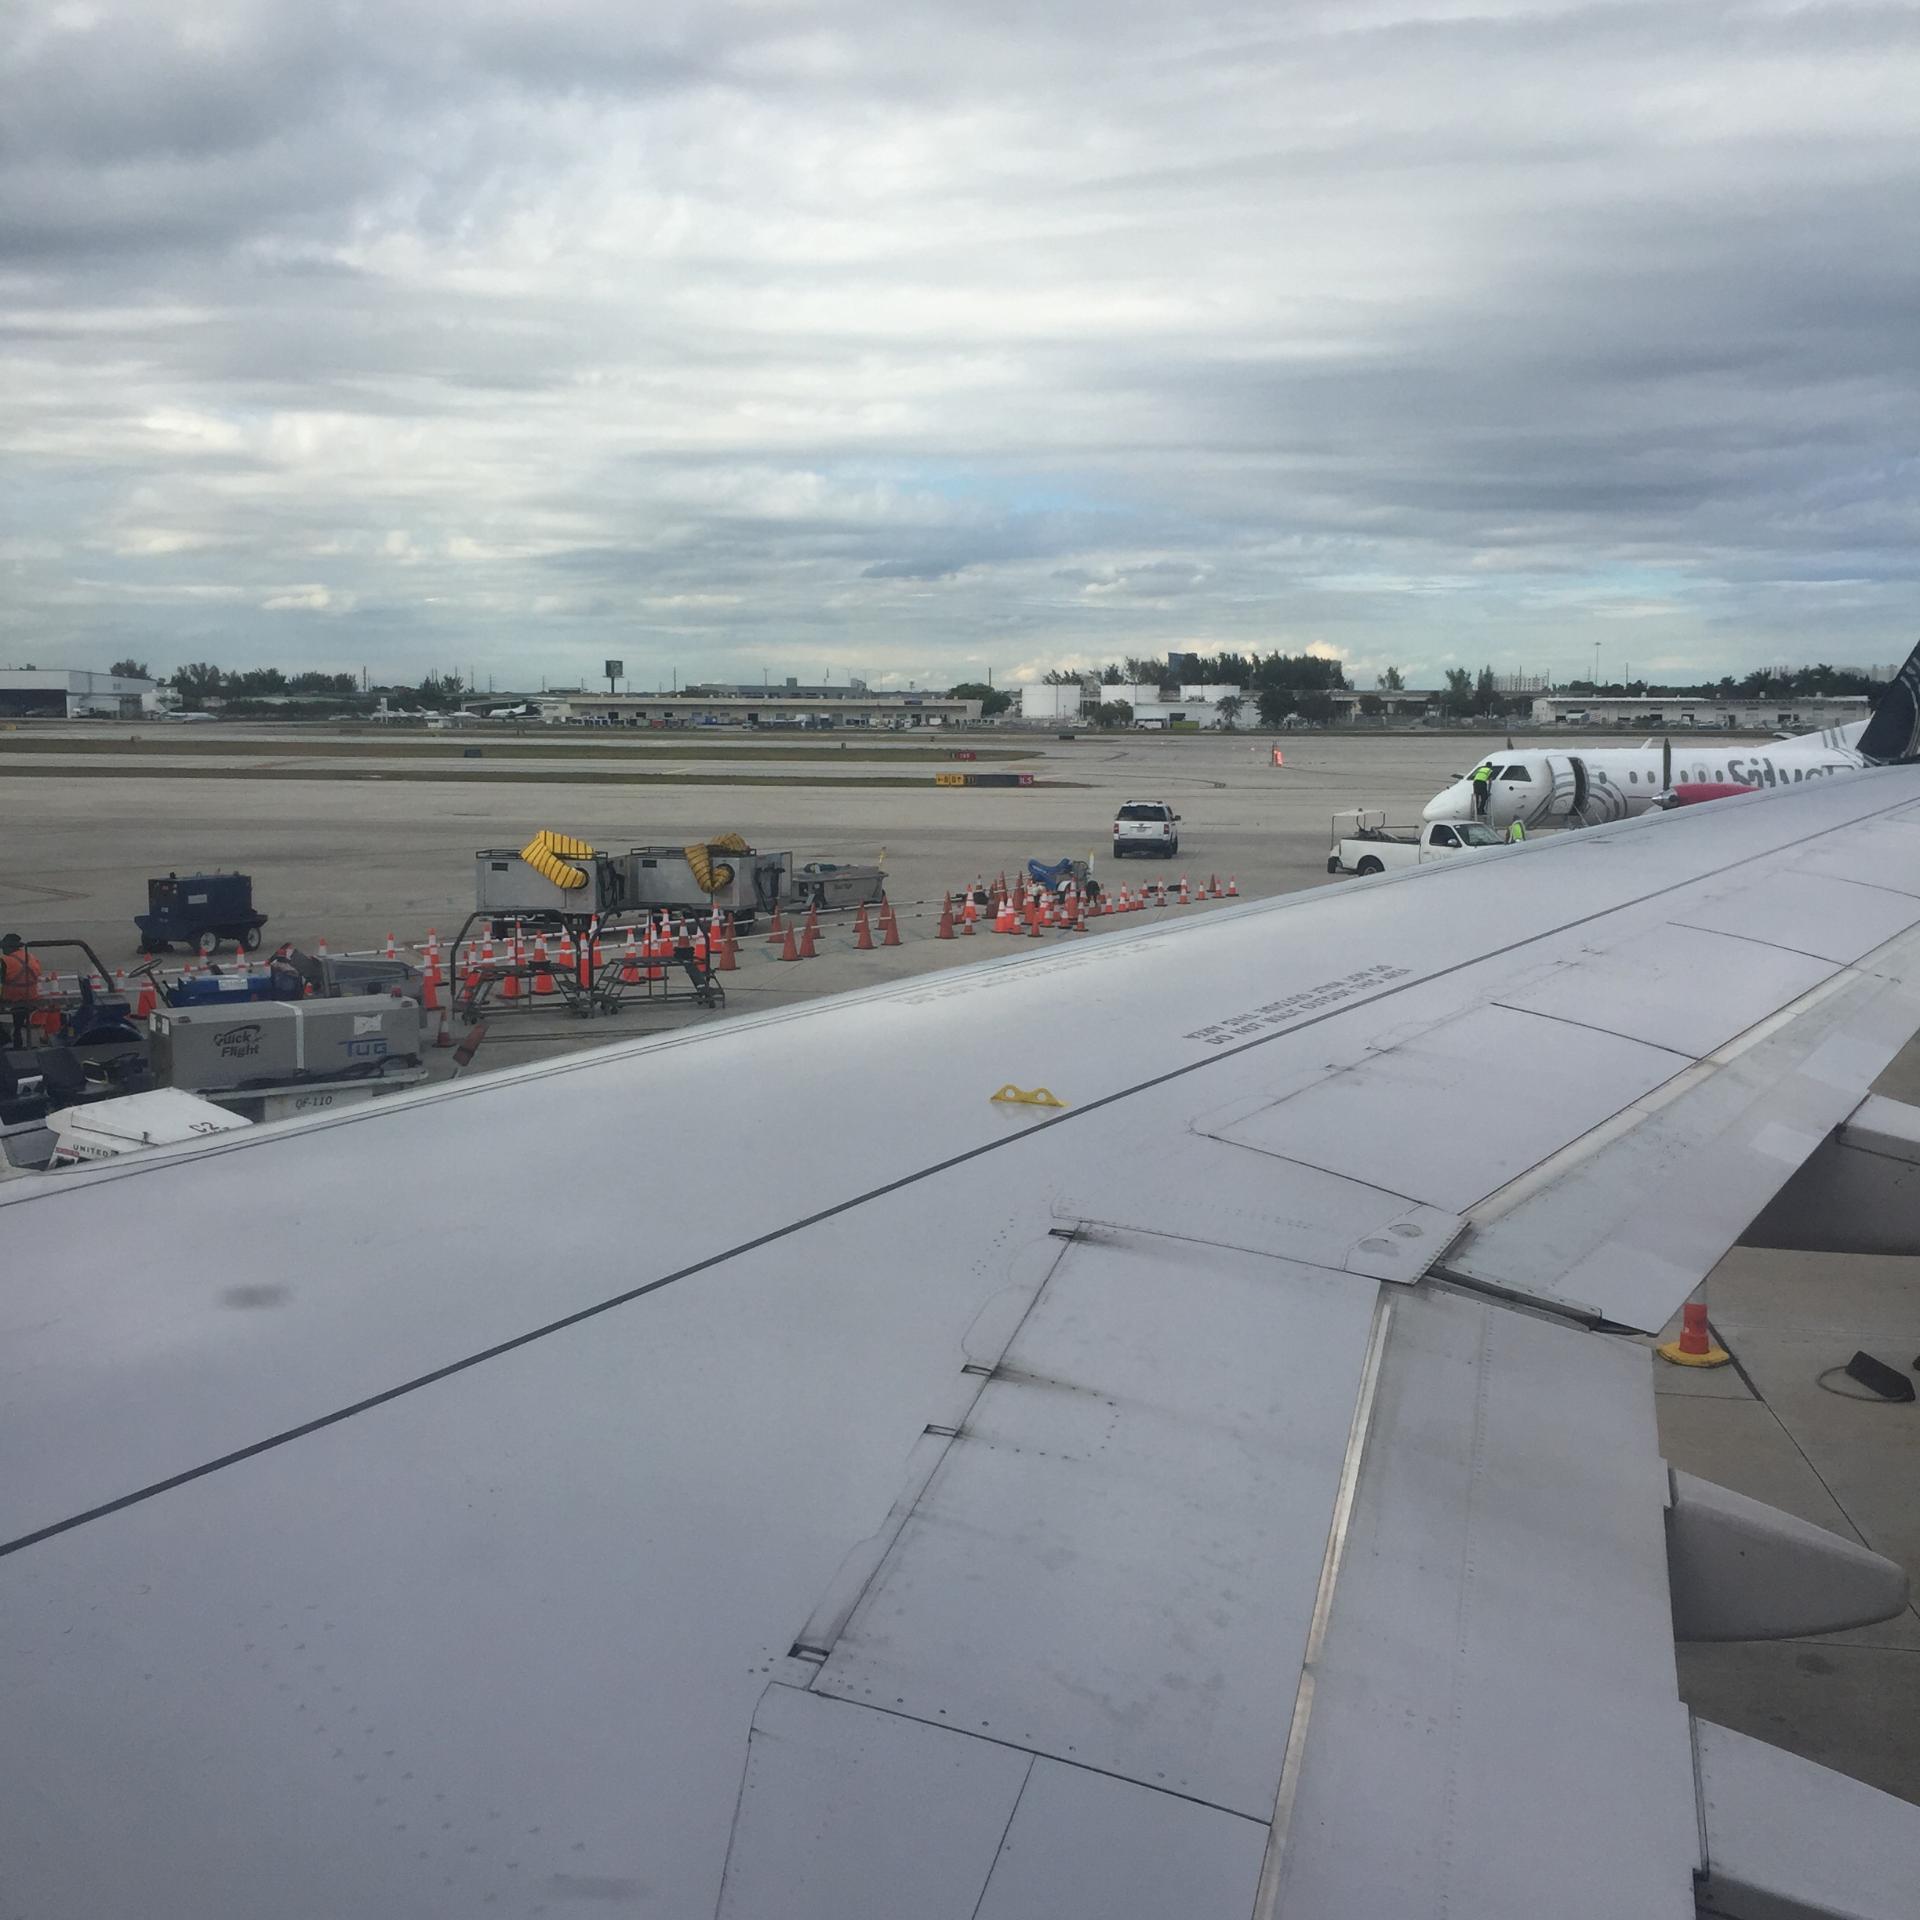 Leaving Ft. Lauderdale